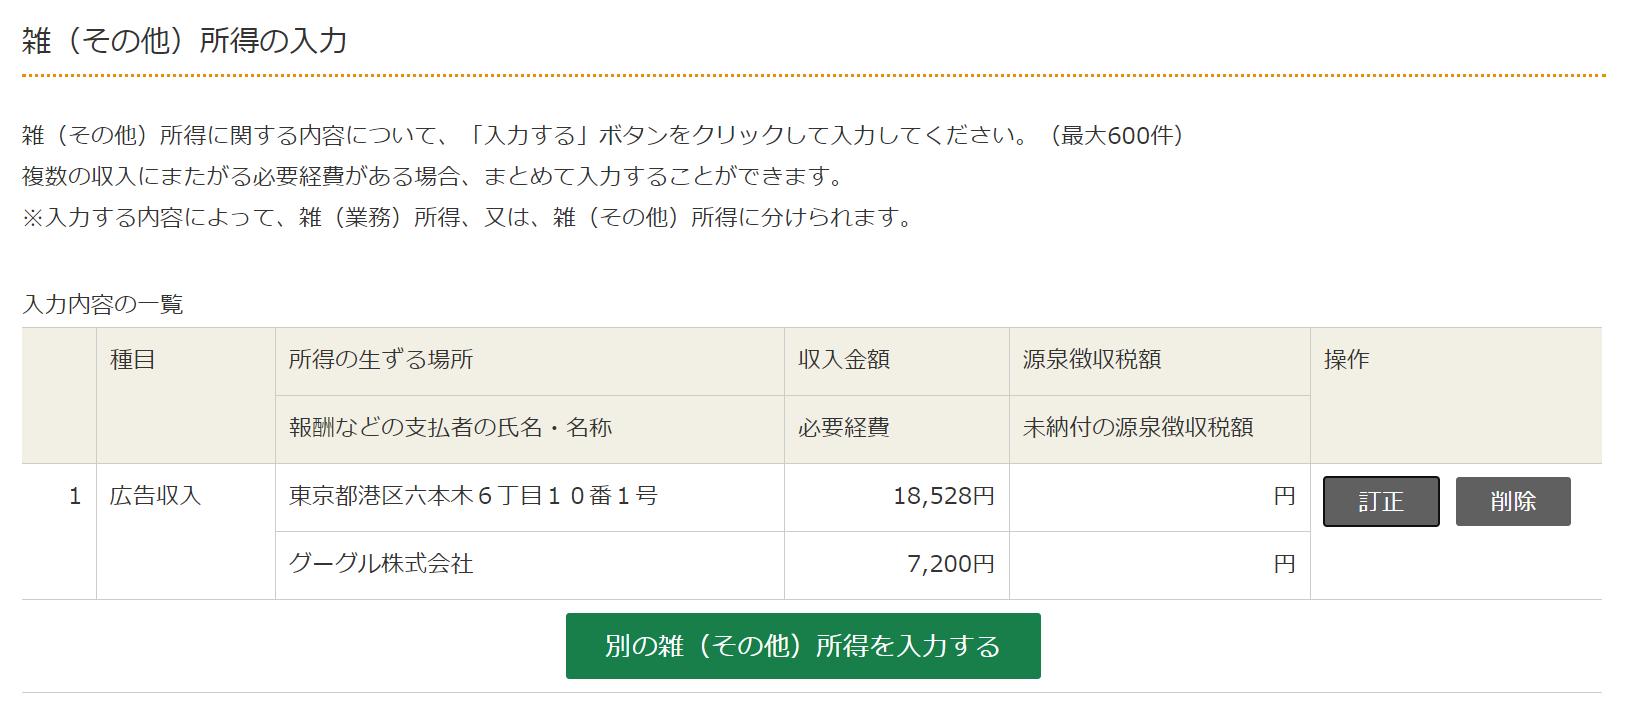 f:id:hodo-work:20210127204130p:plain